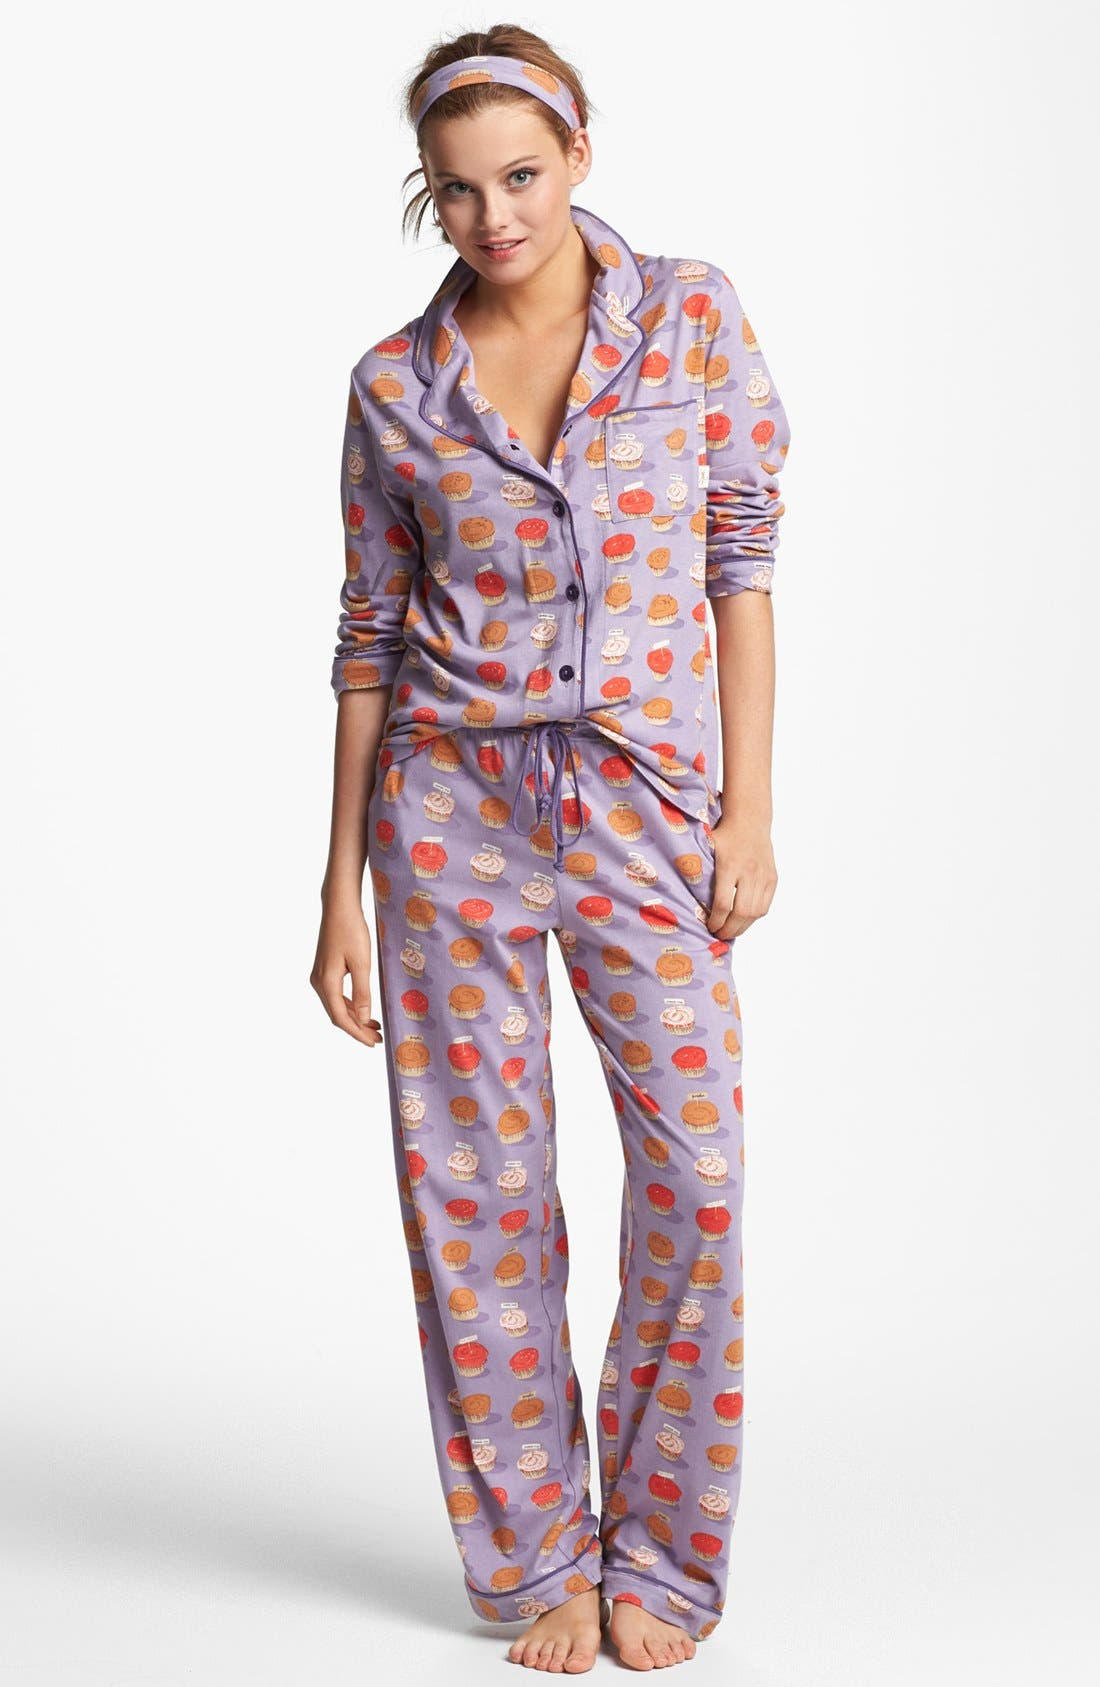 Alternate Image 1 Selected - Munki Munki Print Pajamas